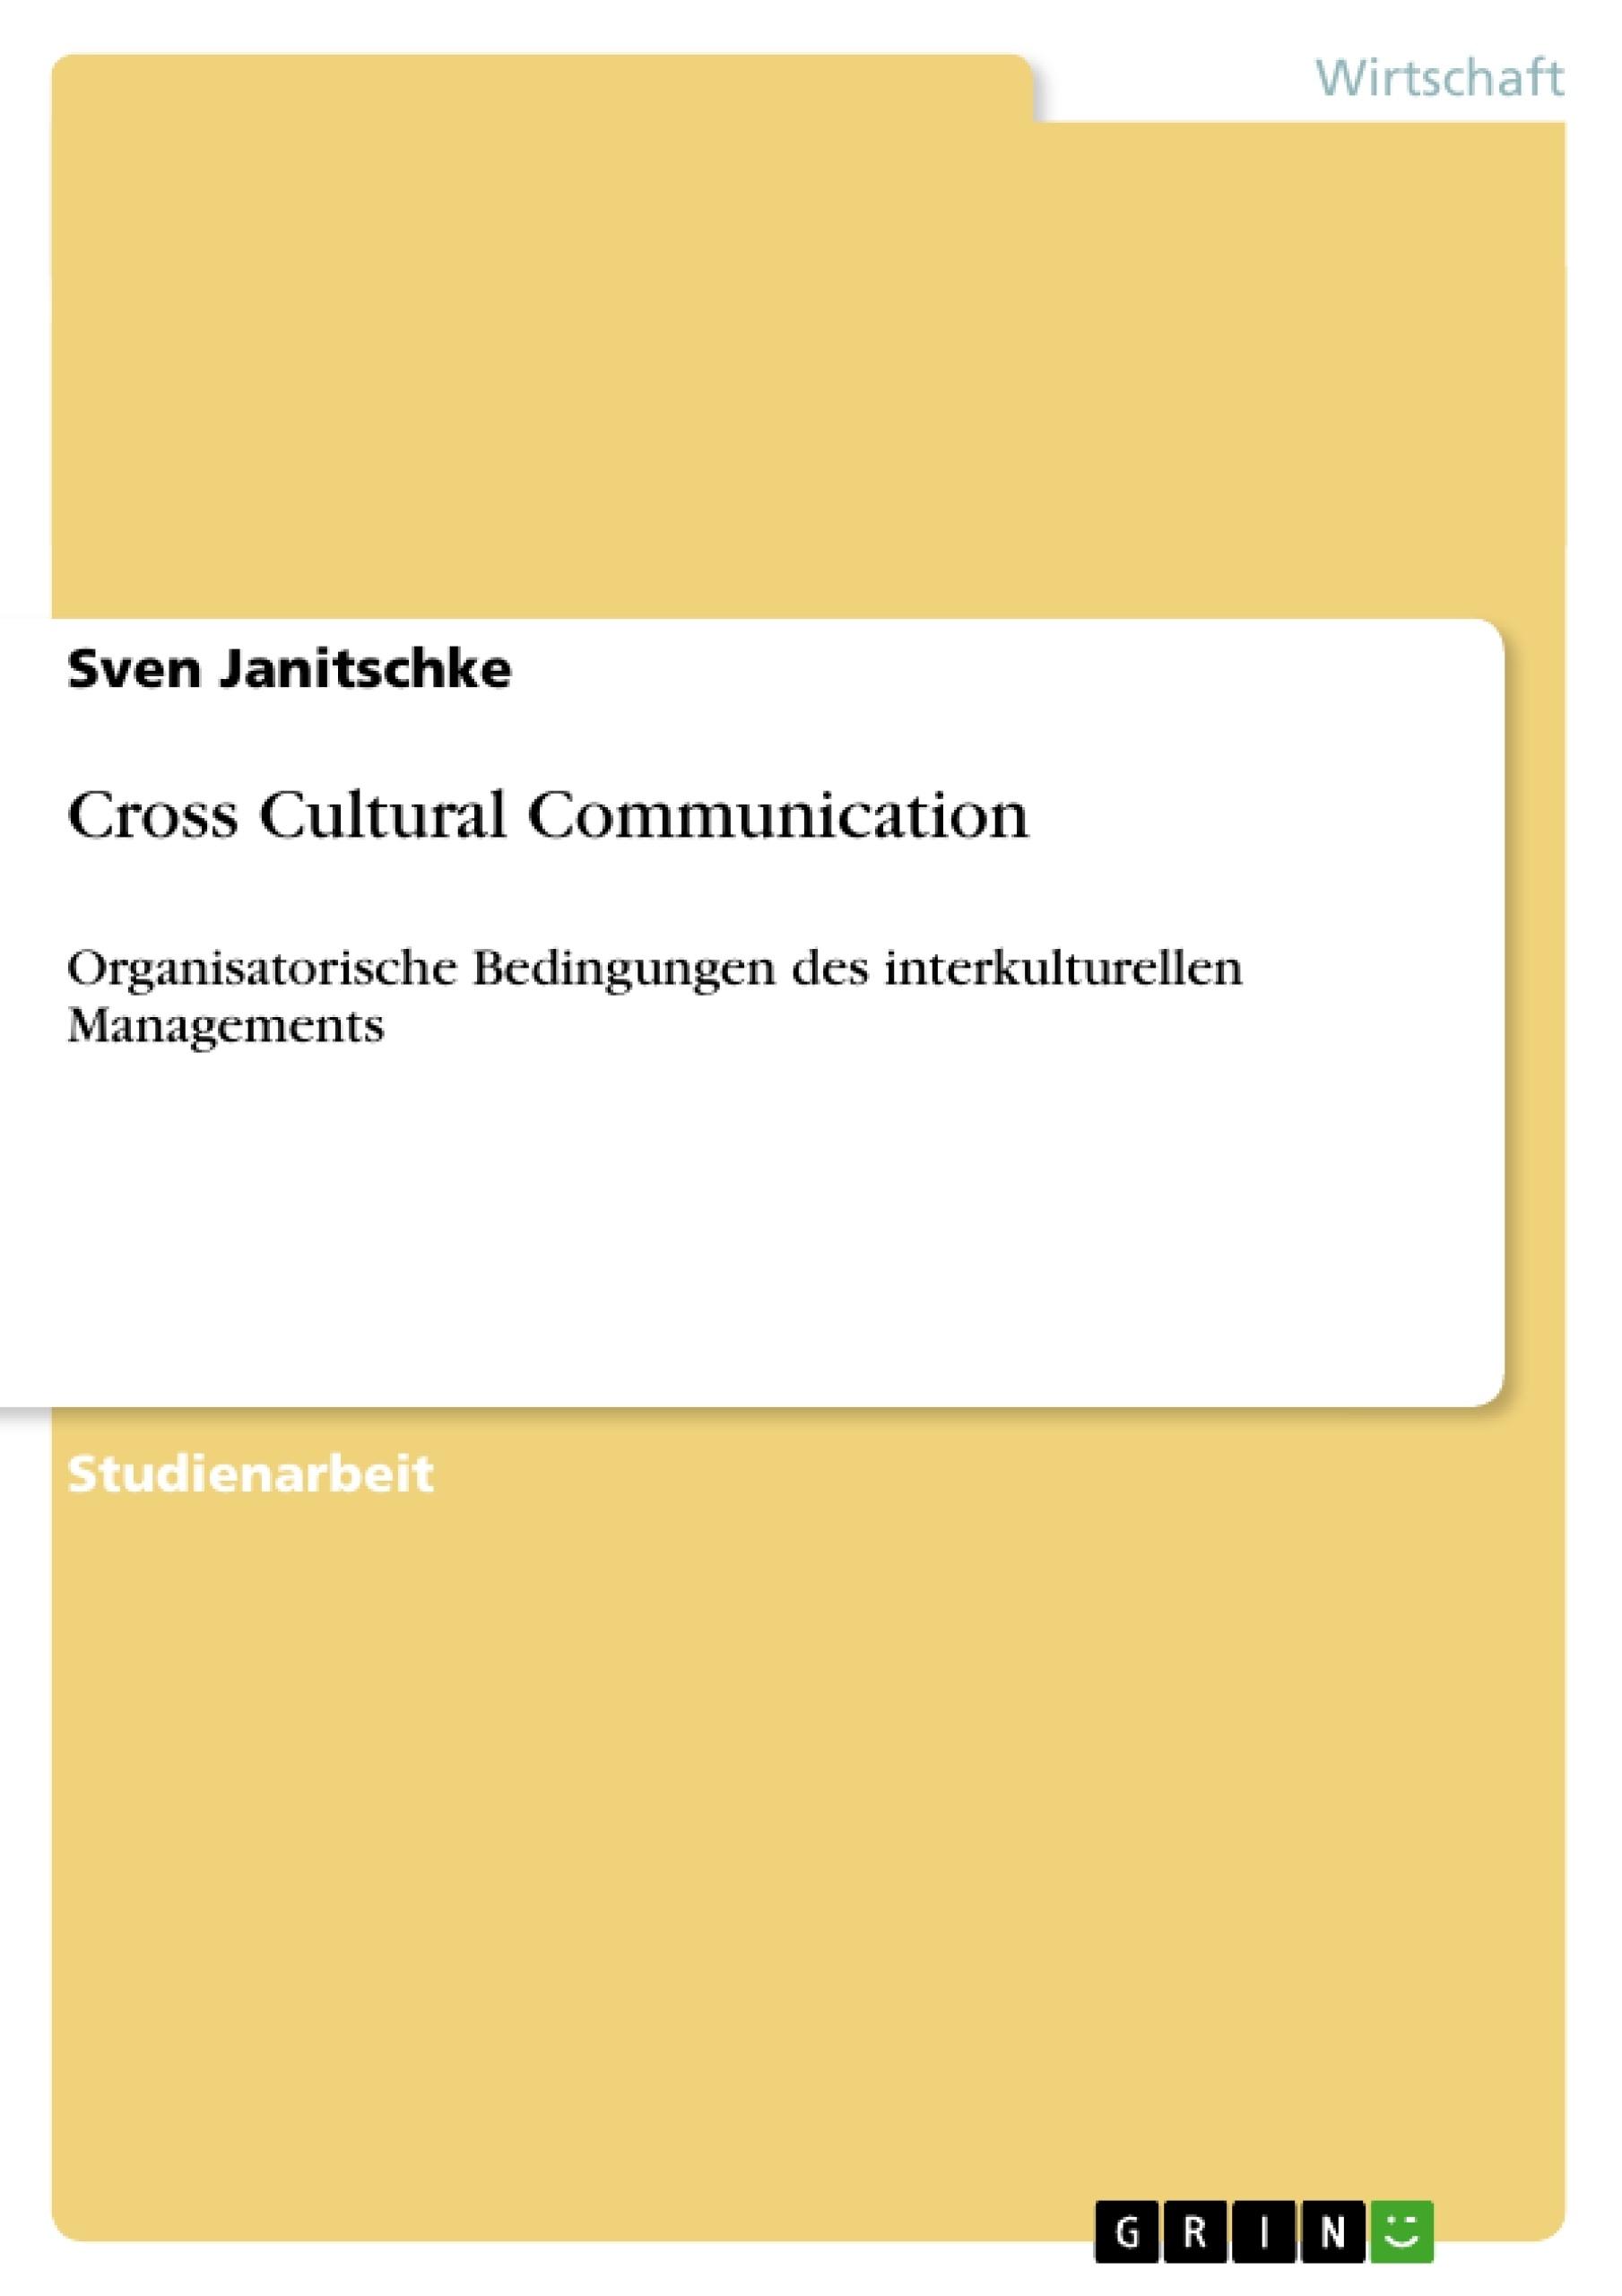 Titel: Cross Cultural Communication